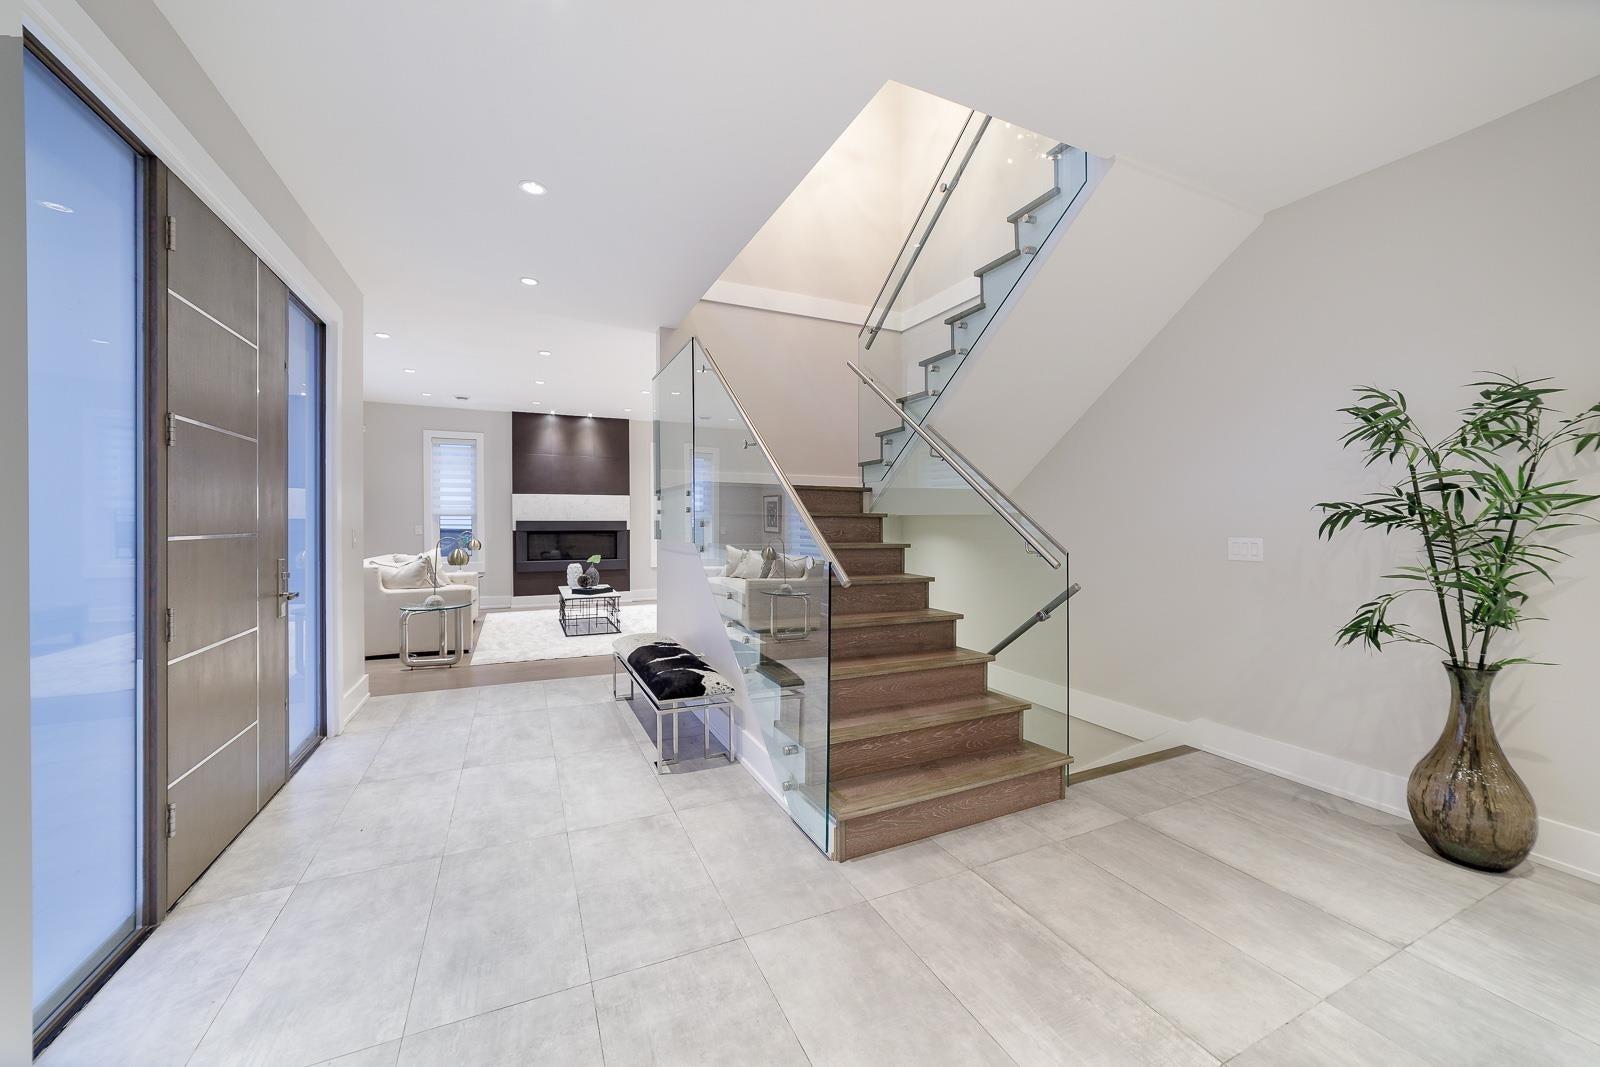 517 GRANADA CRESCENT - Upper Delbrook House/Single Family for sale, 8 Bedrooms (R2615057) - #2